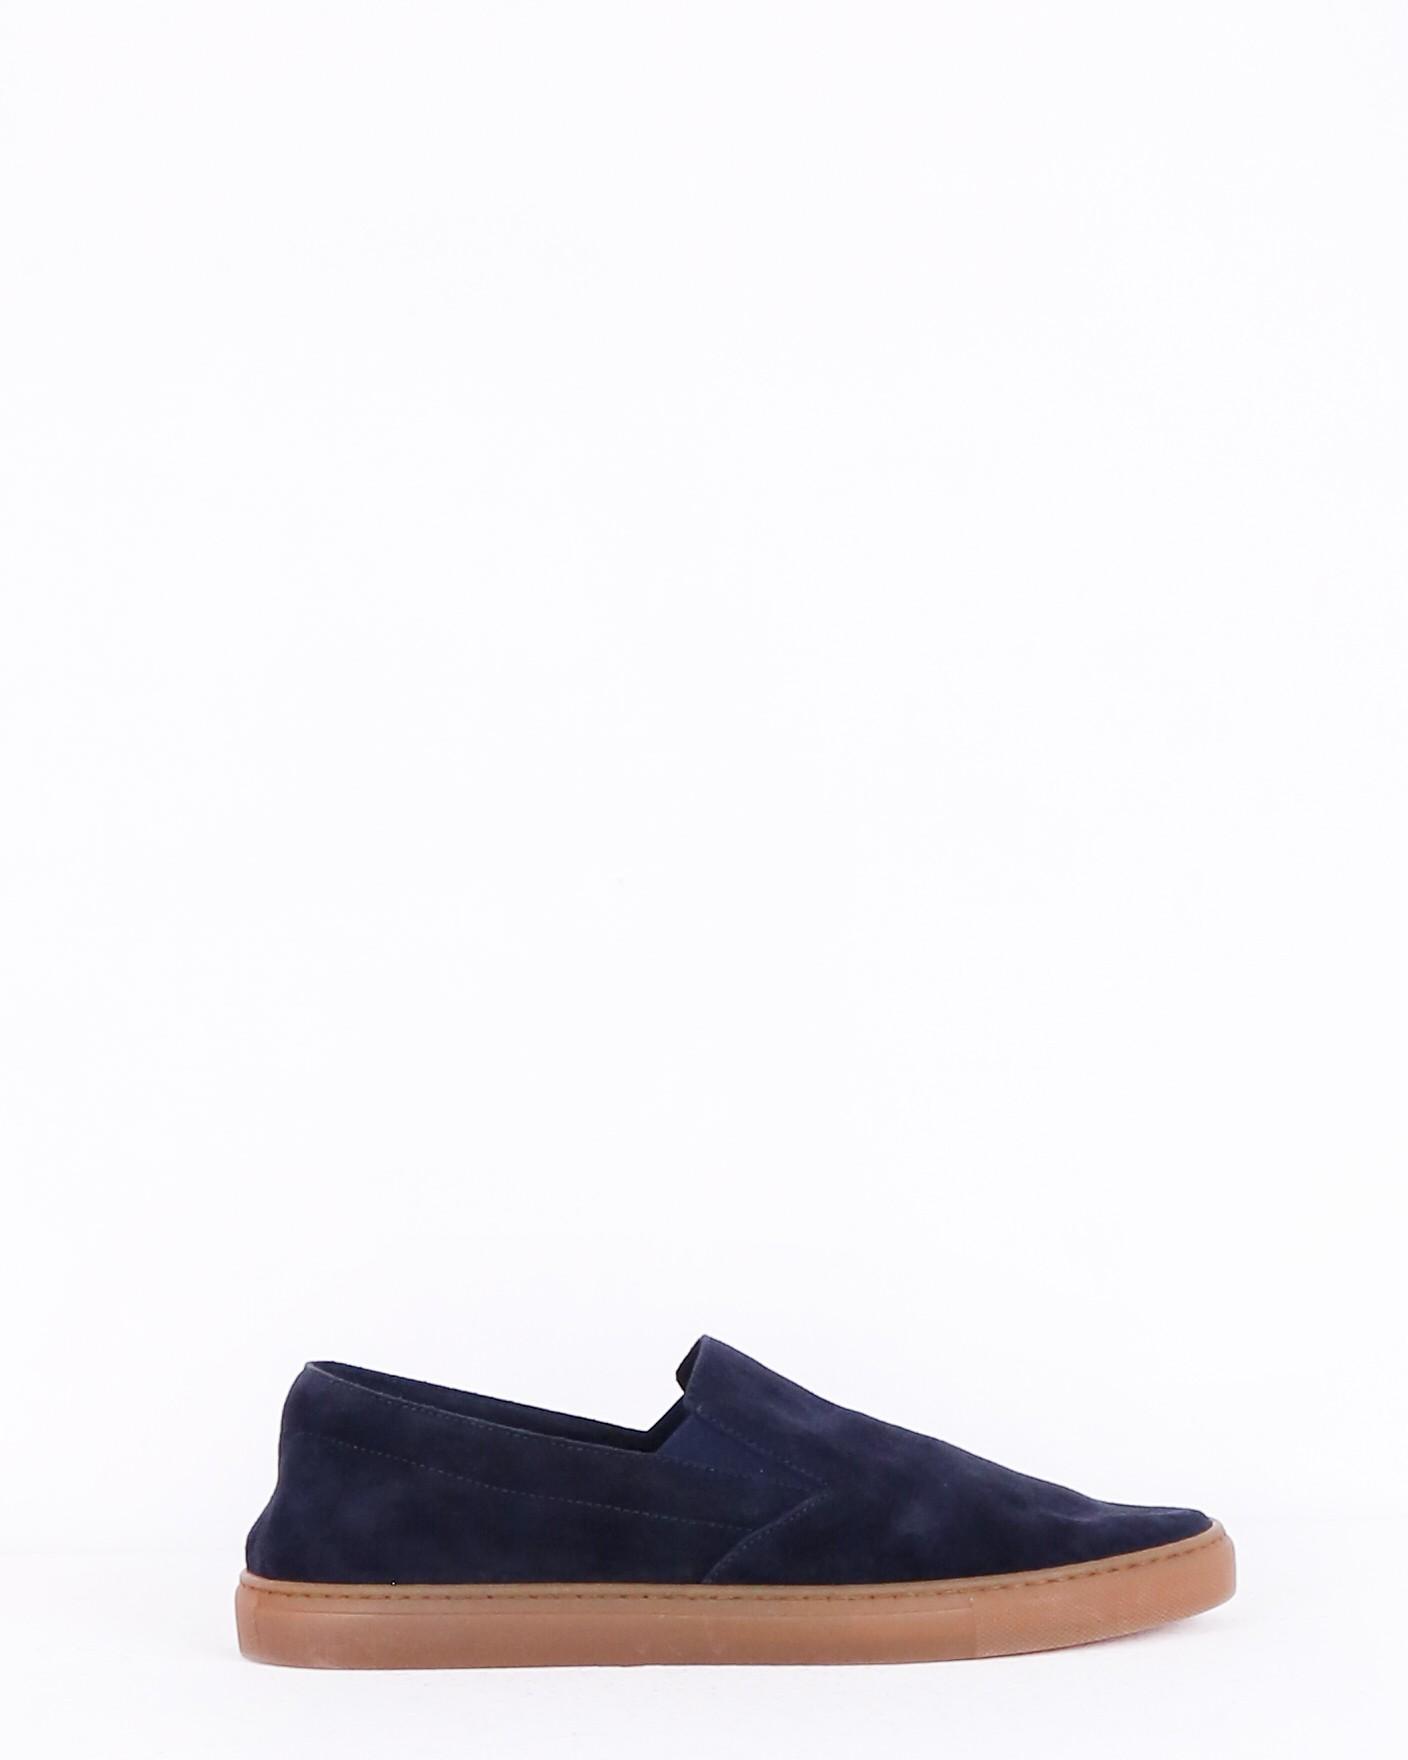 Slippers en nubuck bleu Casheart